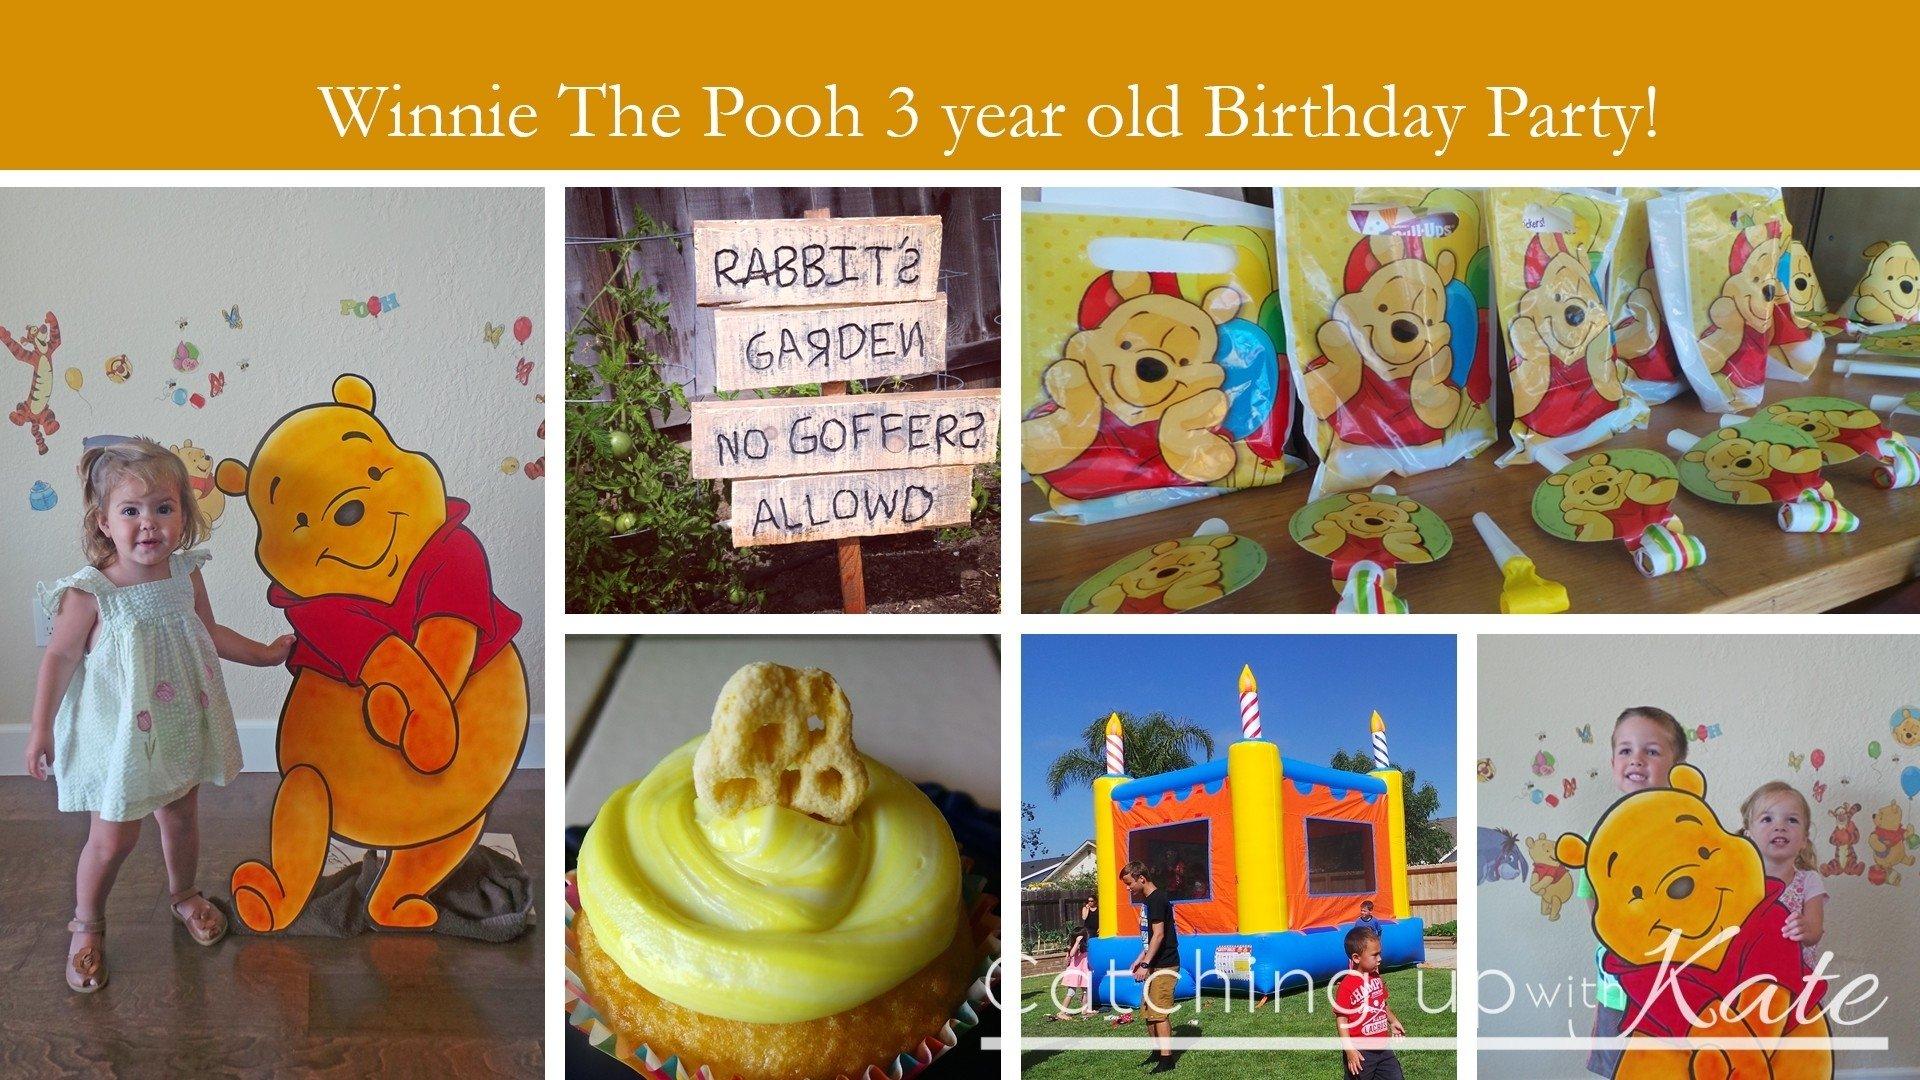 10 Pretty Winnie The Pooh Birthday Party Ideas winnie the pooh birthday party